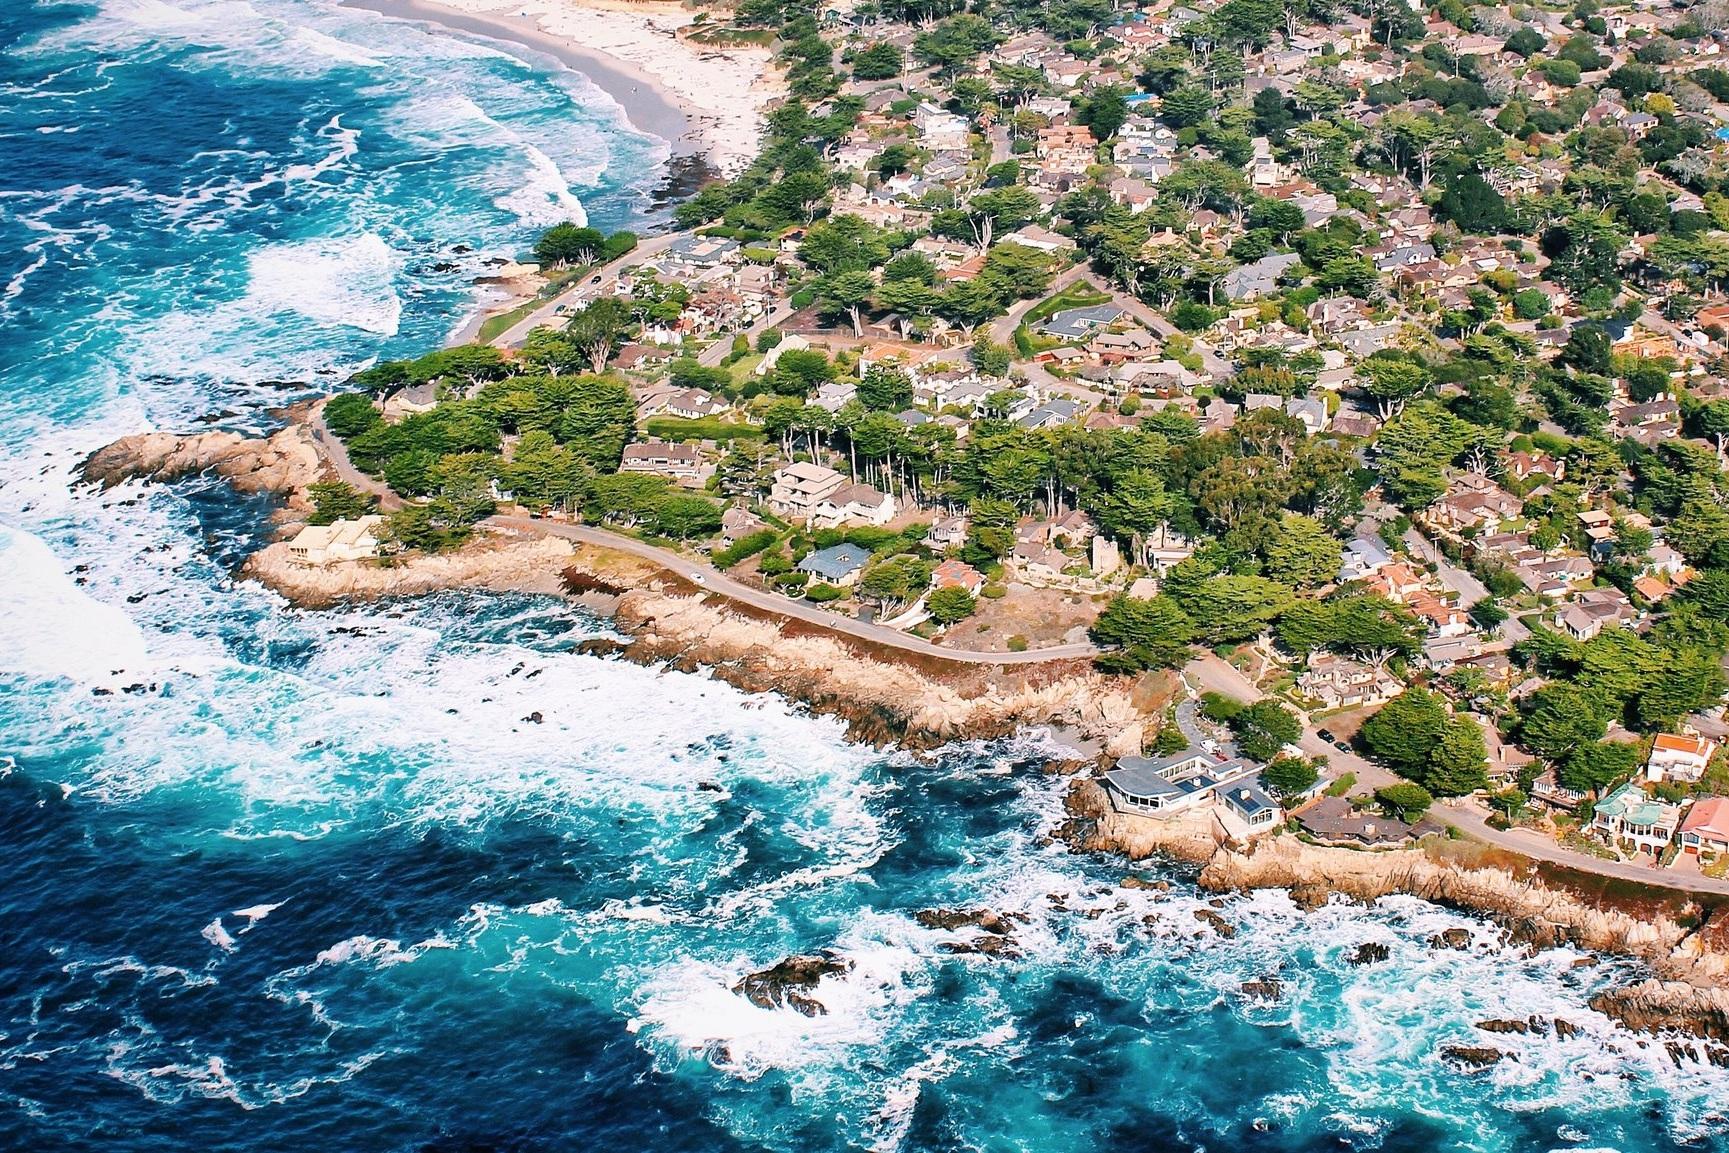 Photo: Carmel-by-the-Sea, California